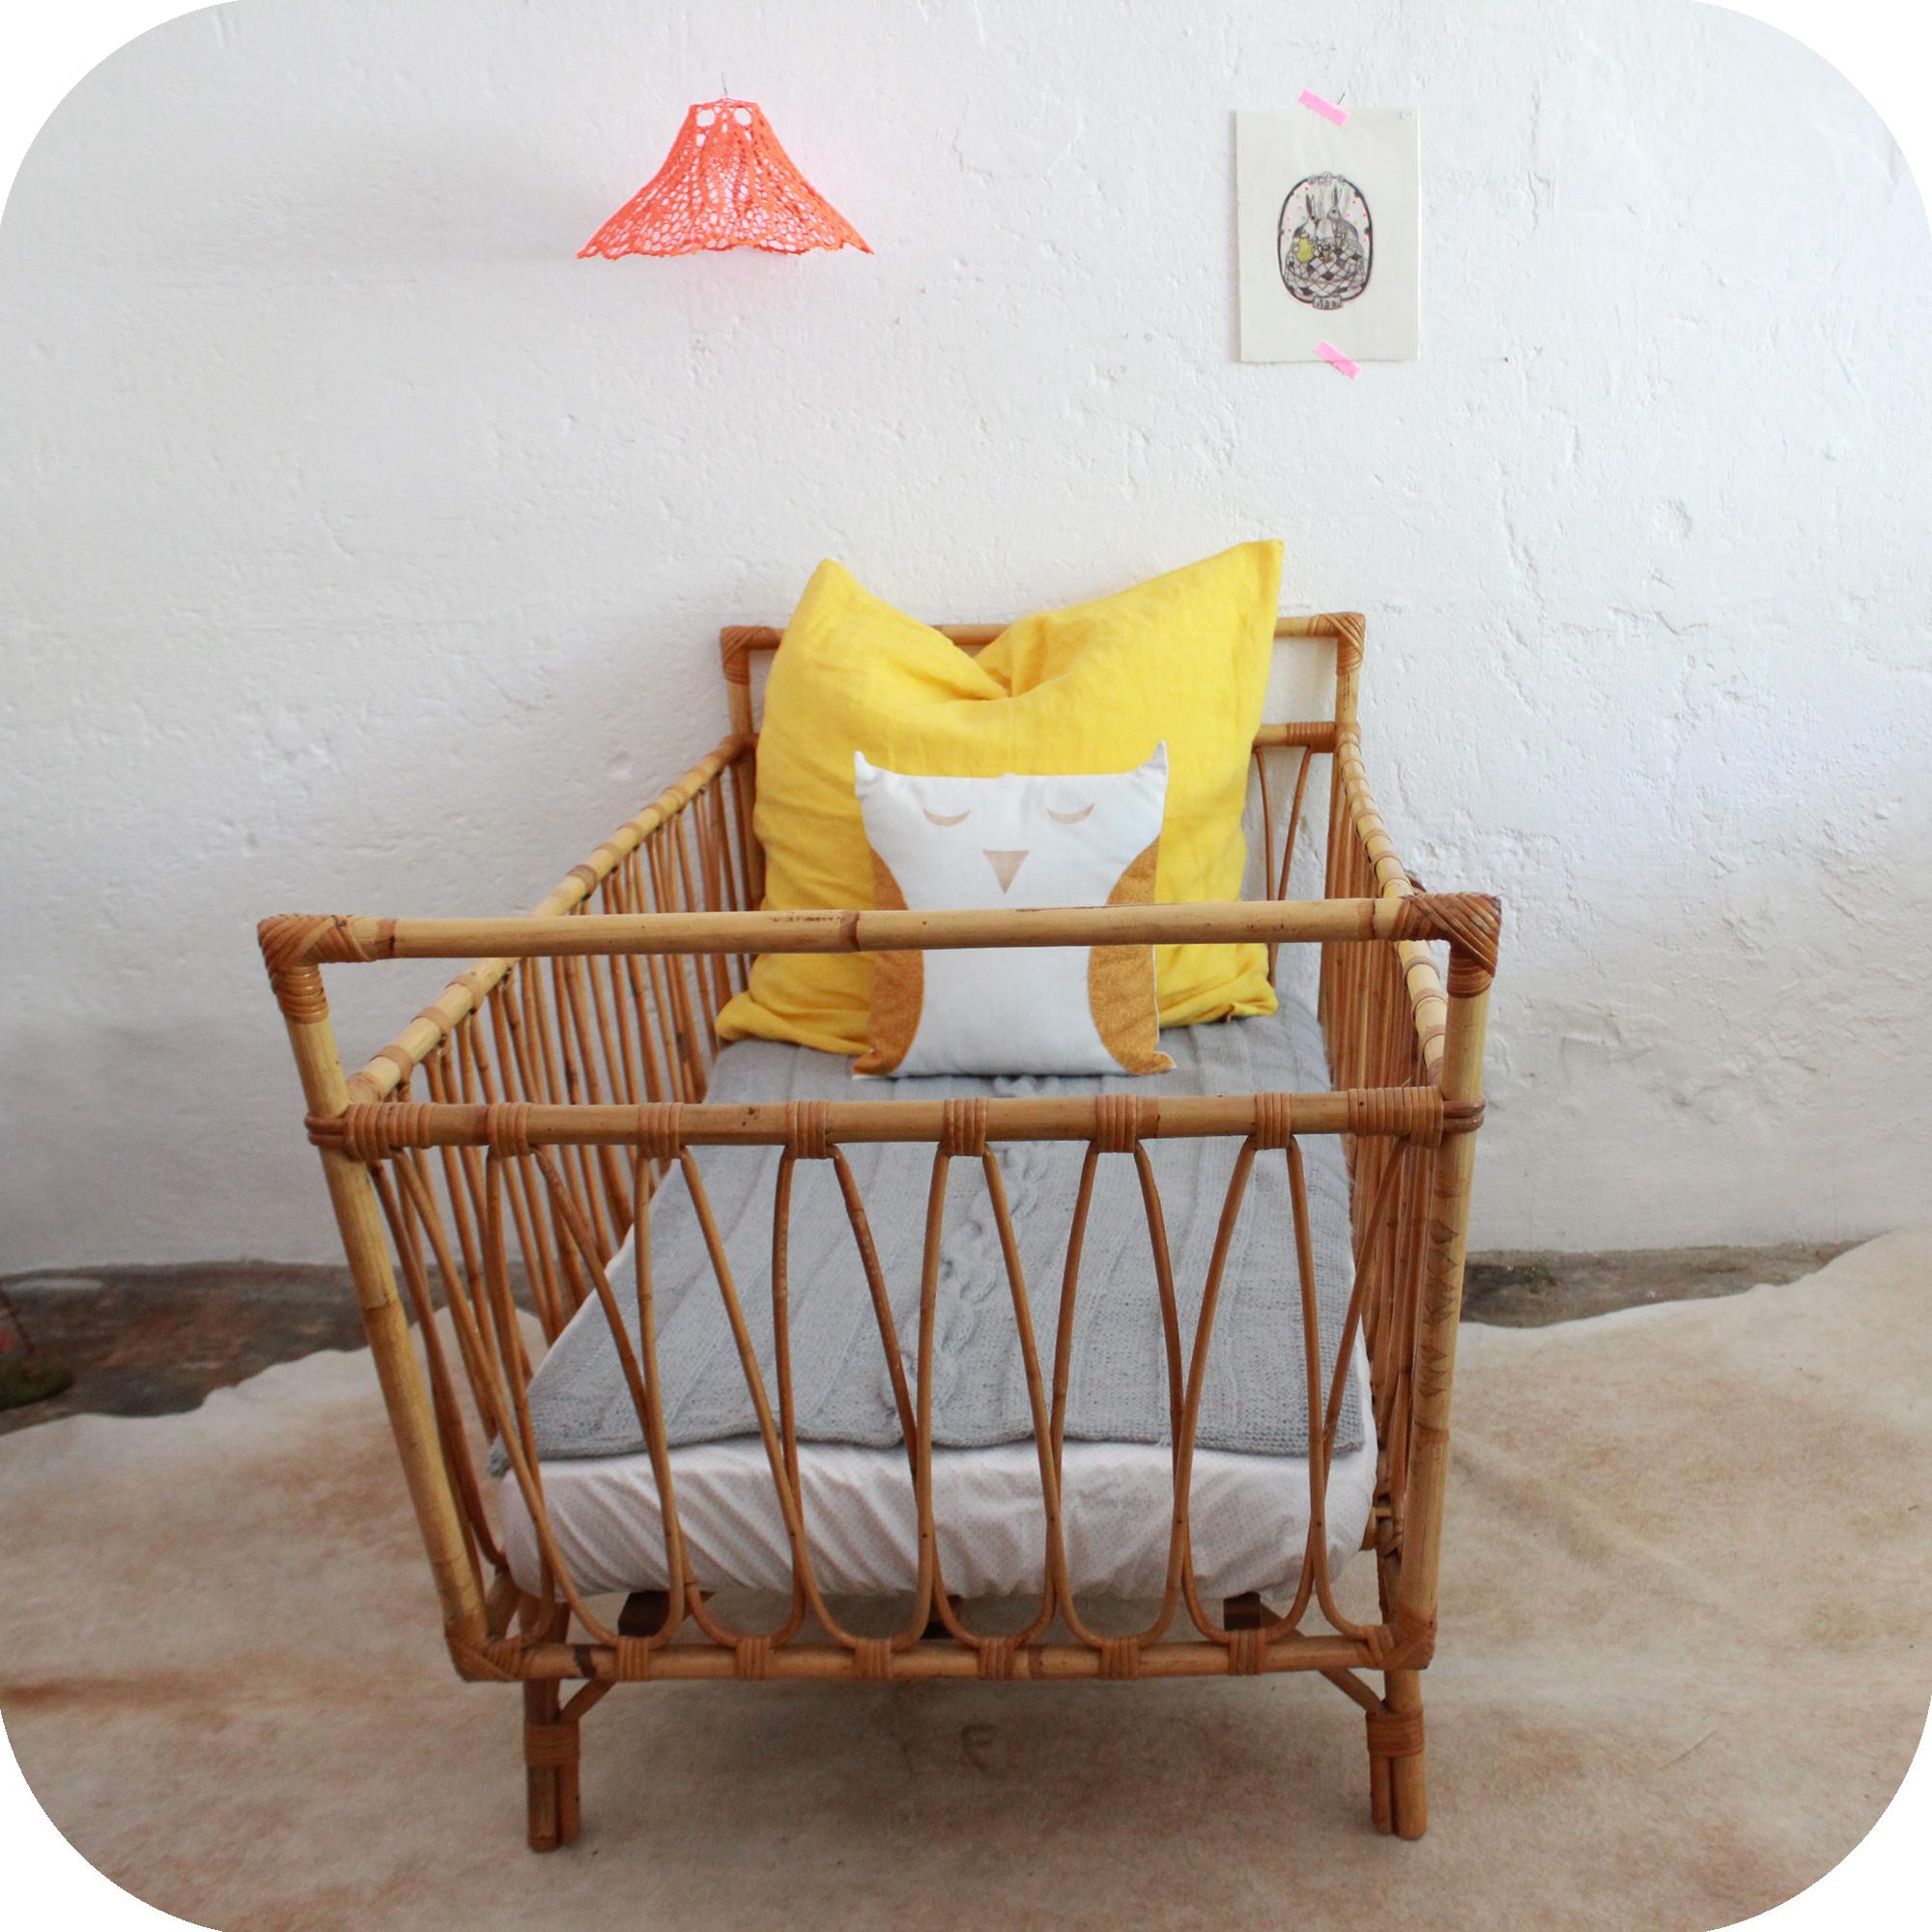 D538 mobilier vintage lit vintage enfant c atelier du for Mobilier lit